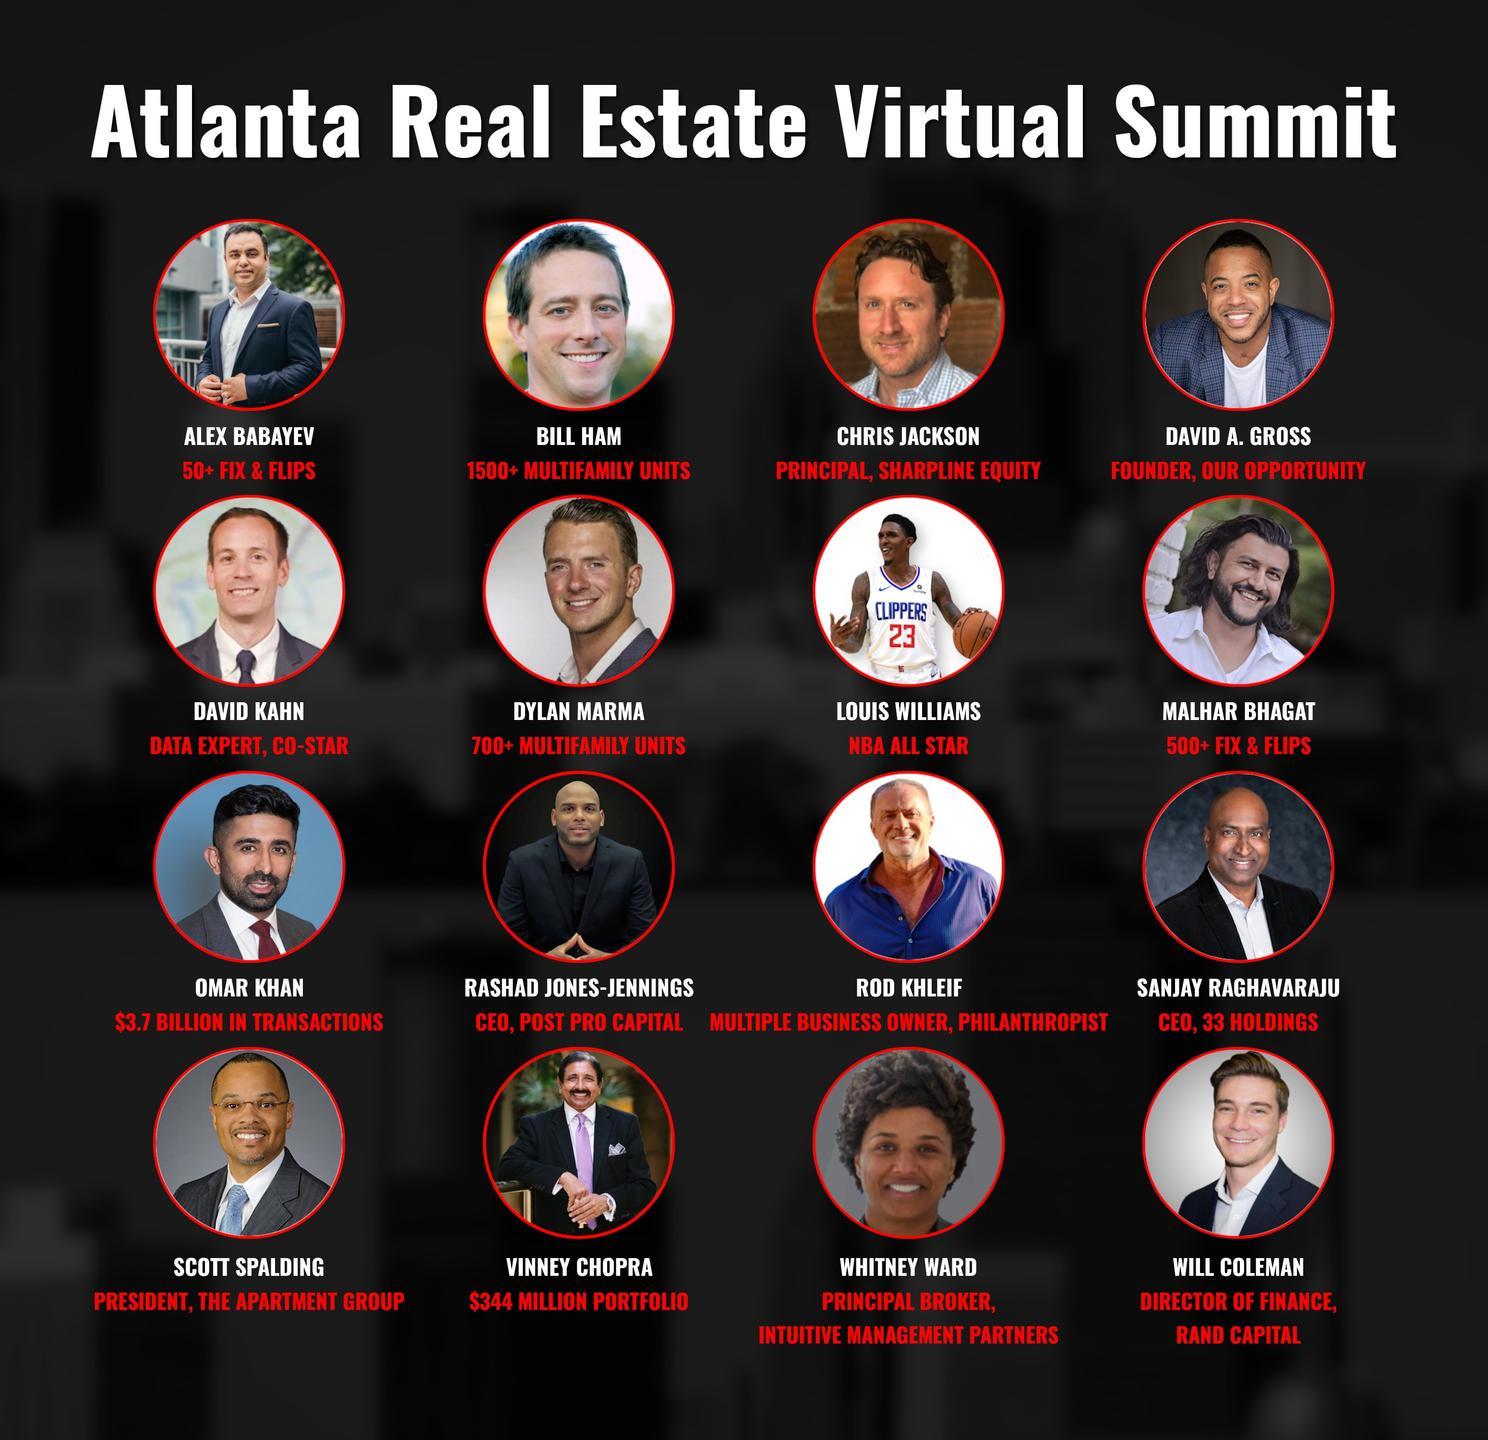 Atlanta Real Estate Virtual Summit (EARLY BIRD SPECIAL!), Atlanta, Georgia, United States